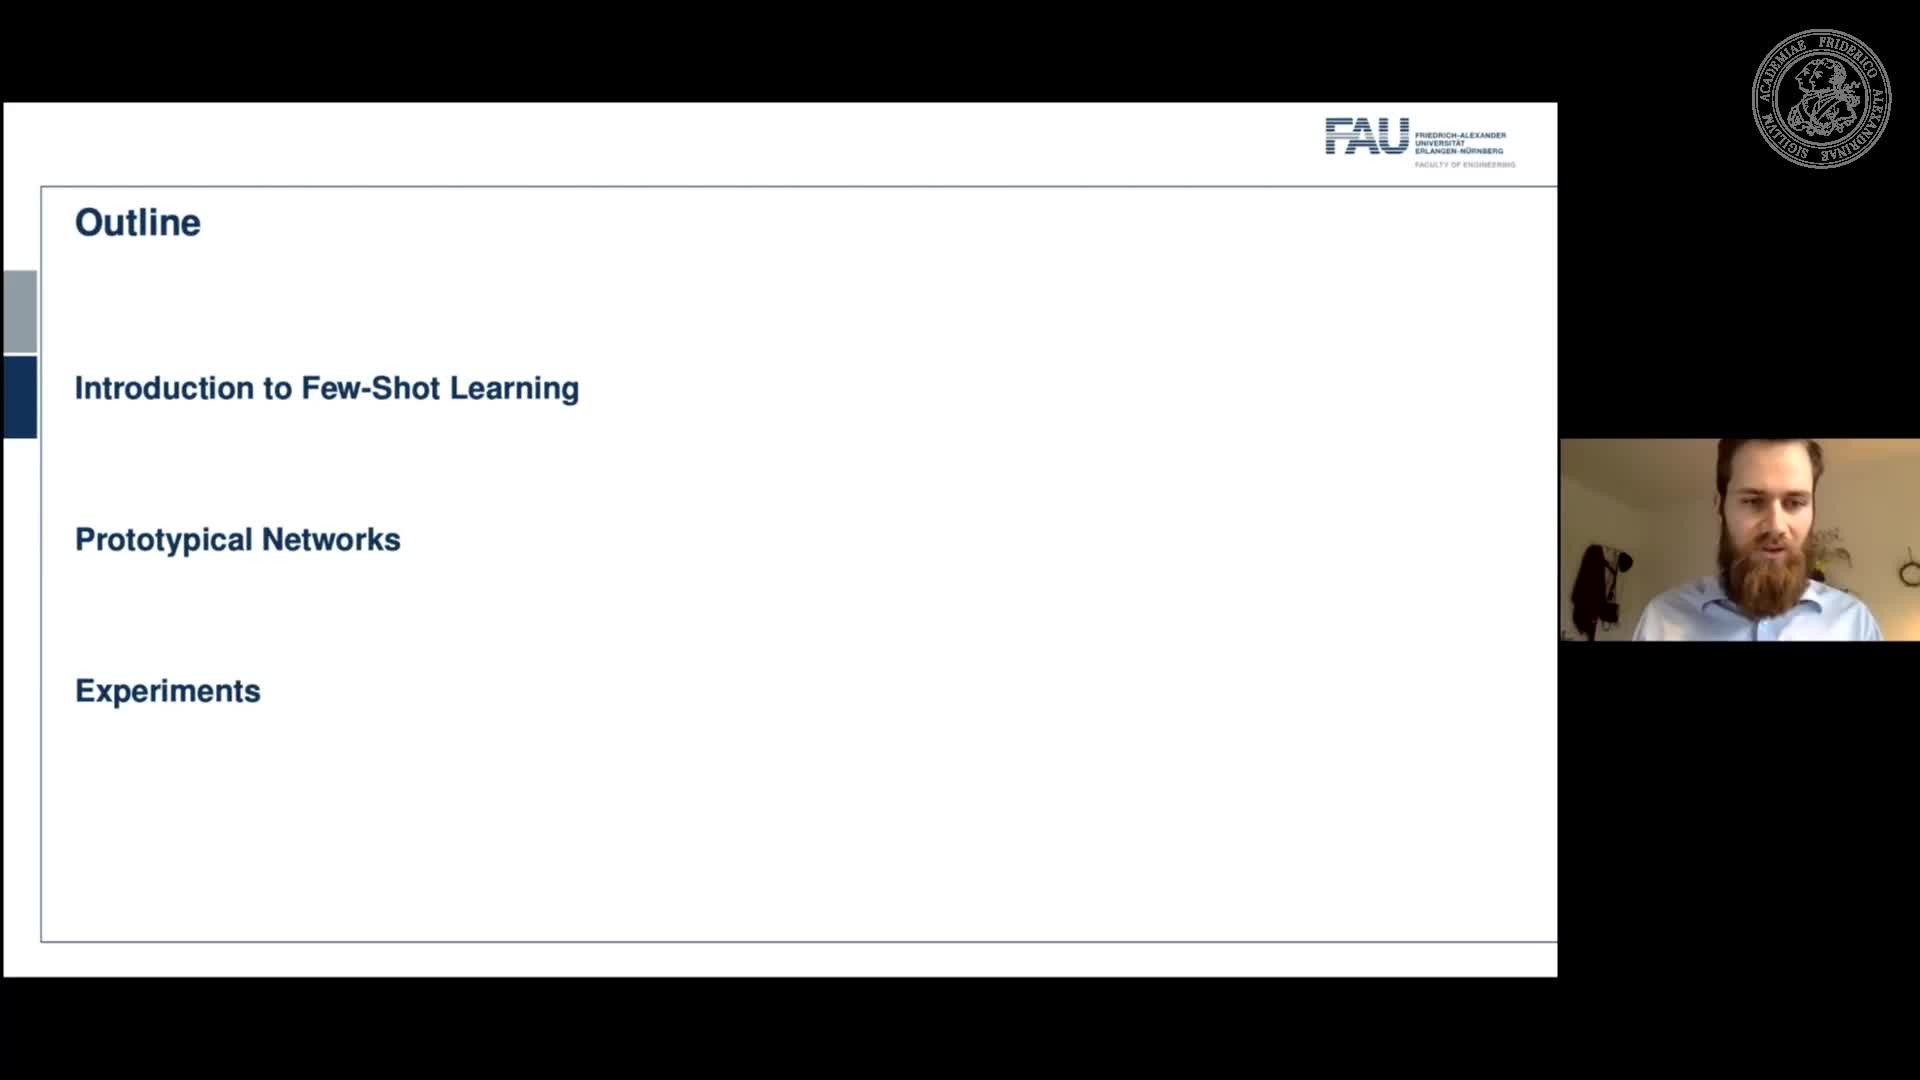 Seminar Meta Learning (SemMeL) - Jonas Utz - Prototypical Networks for Few-shot Learning preview image